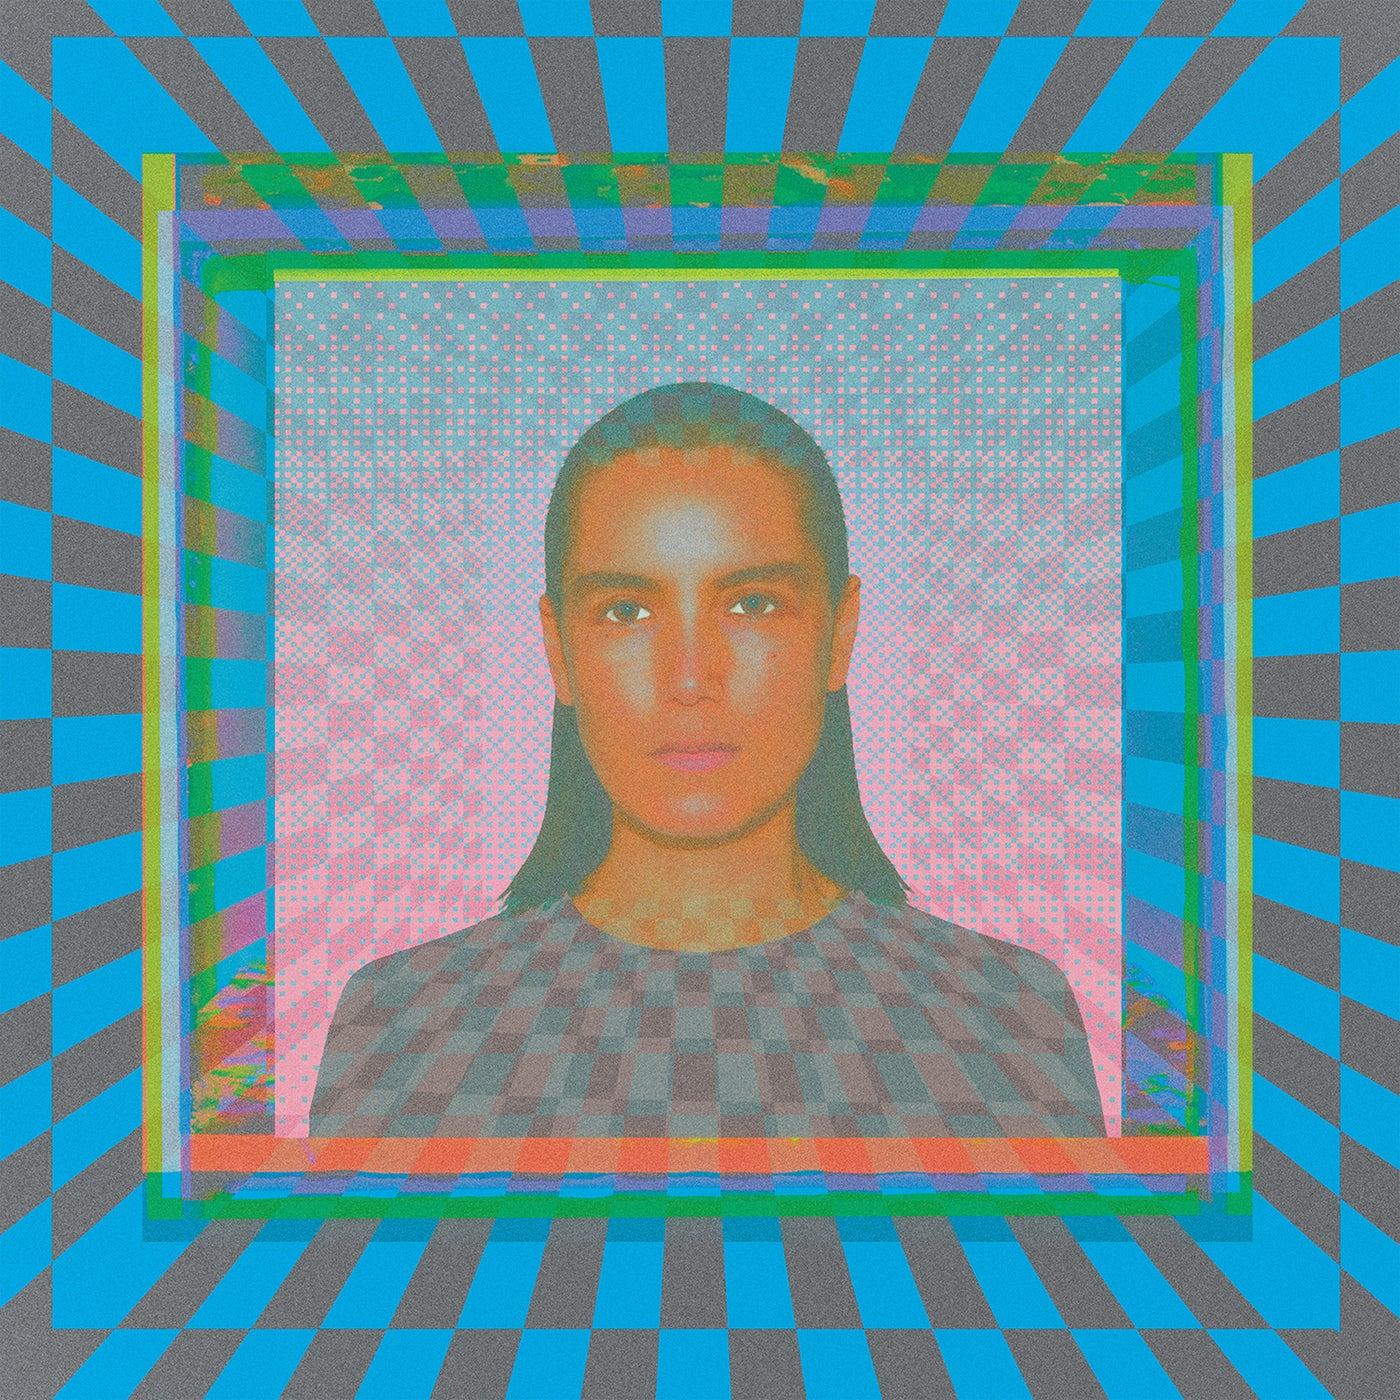 Connection (Luca Lozano Remix)